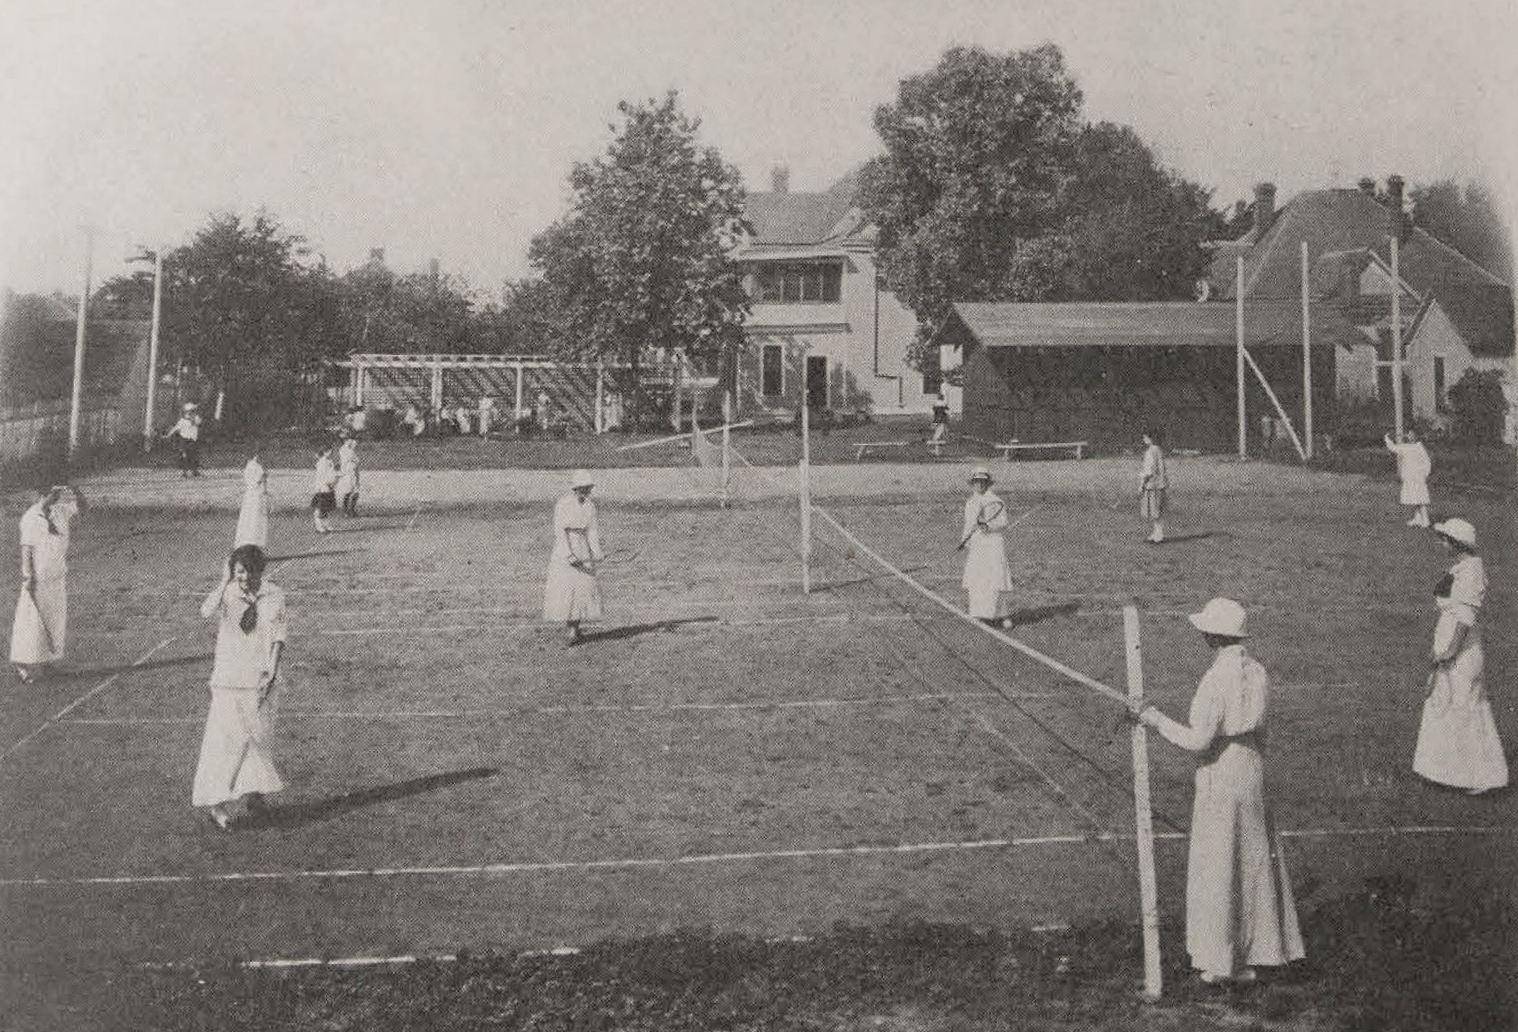 dallas-educational-center_hockaday_tennis_ca-1916_degolyer-library_smu